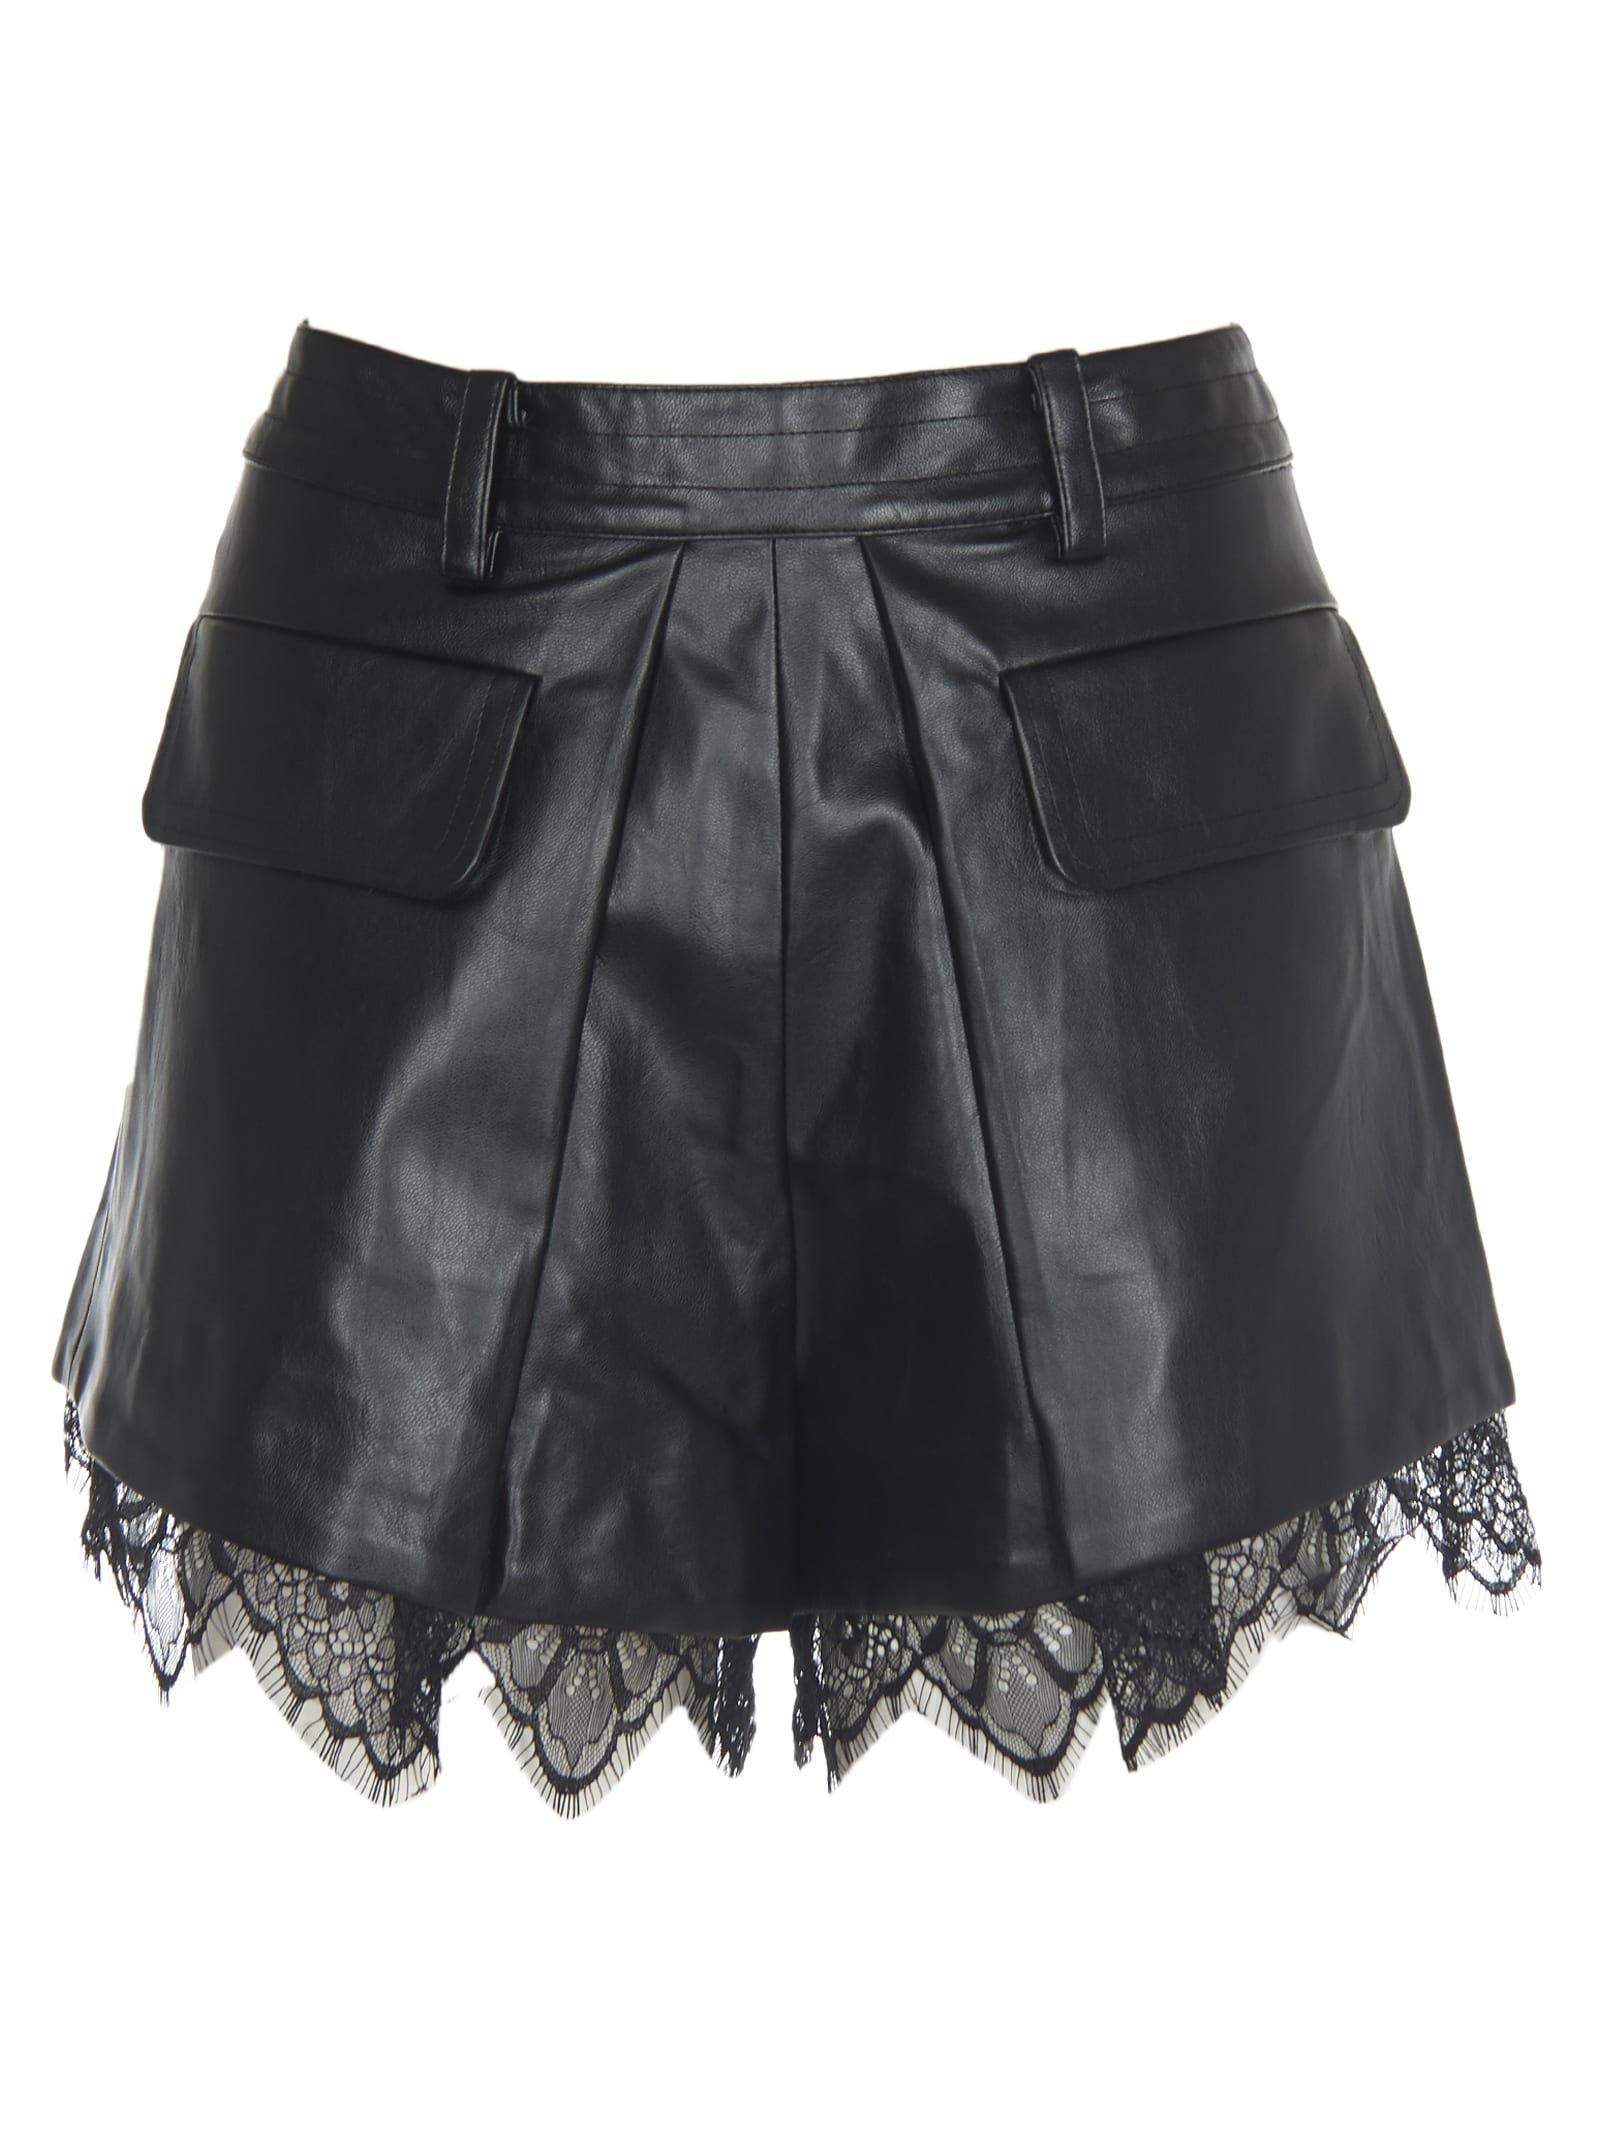 self-portrait Black Faux Leather Shorts With Lace